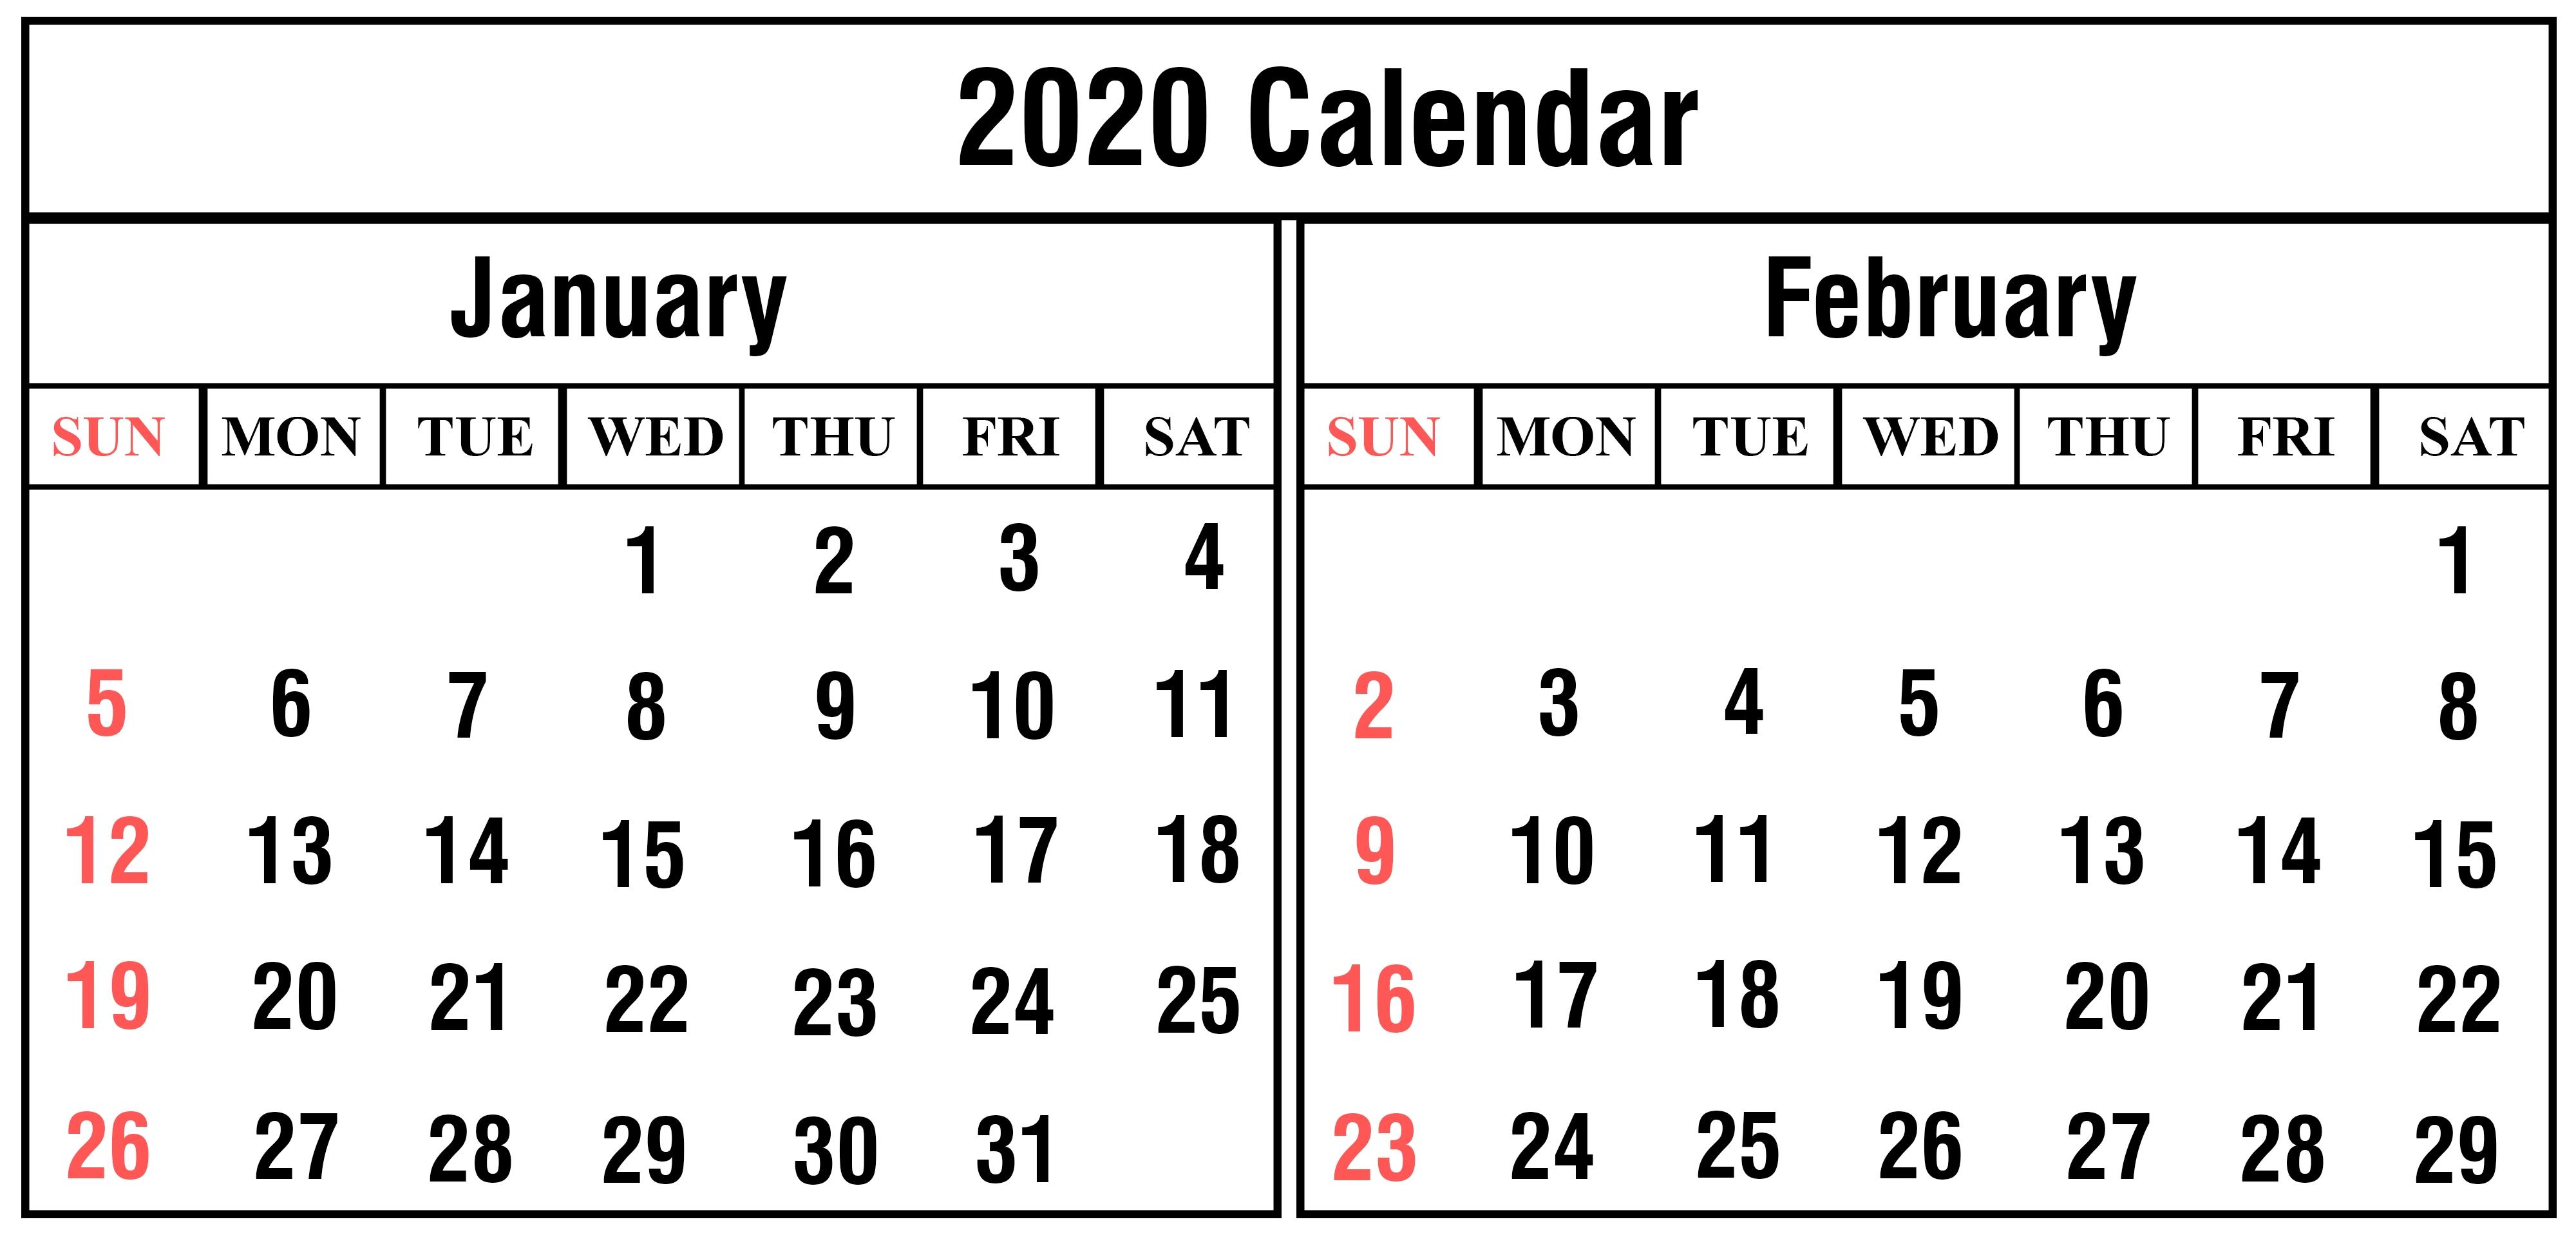 Free January And February 2020 Calendar Printable Templates-2020 January Calendar Sri Lanka